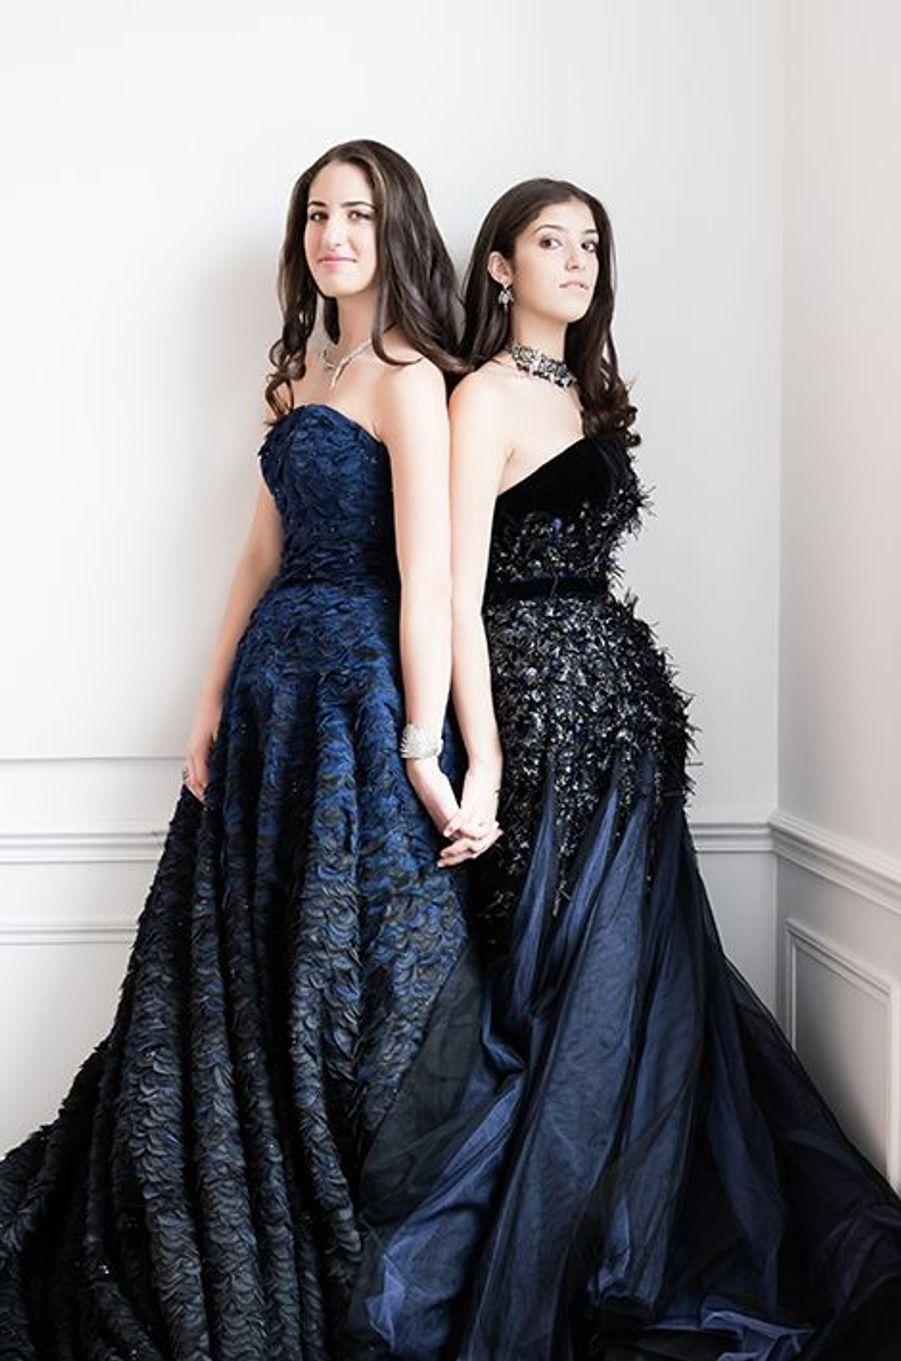 Kareen et Natalia Fares (Liban) en robe Ralph & Russo, bijoux Payal New York